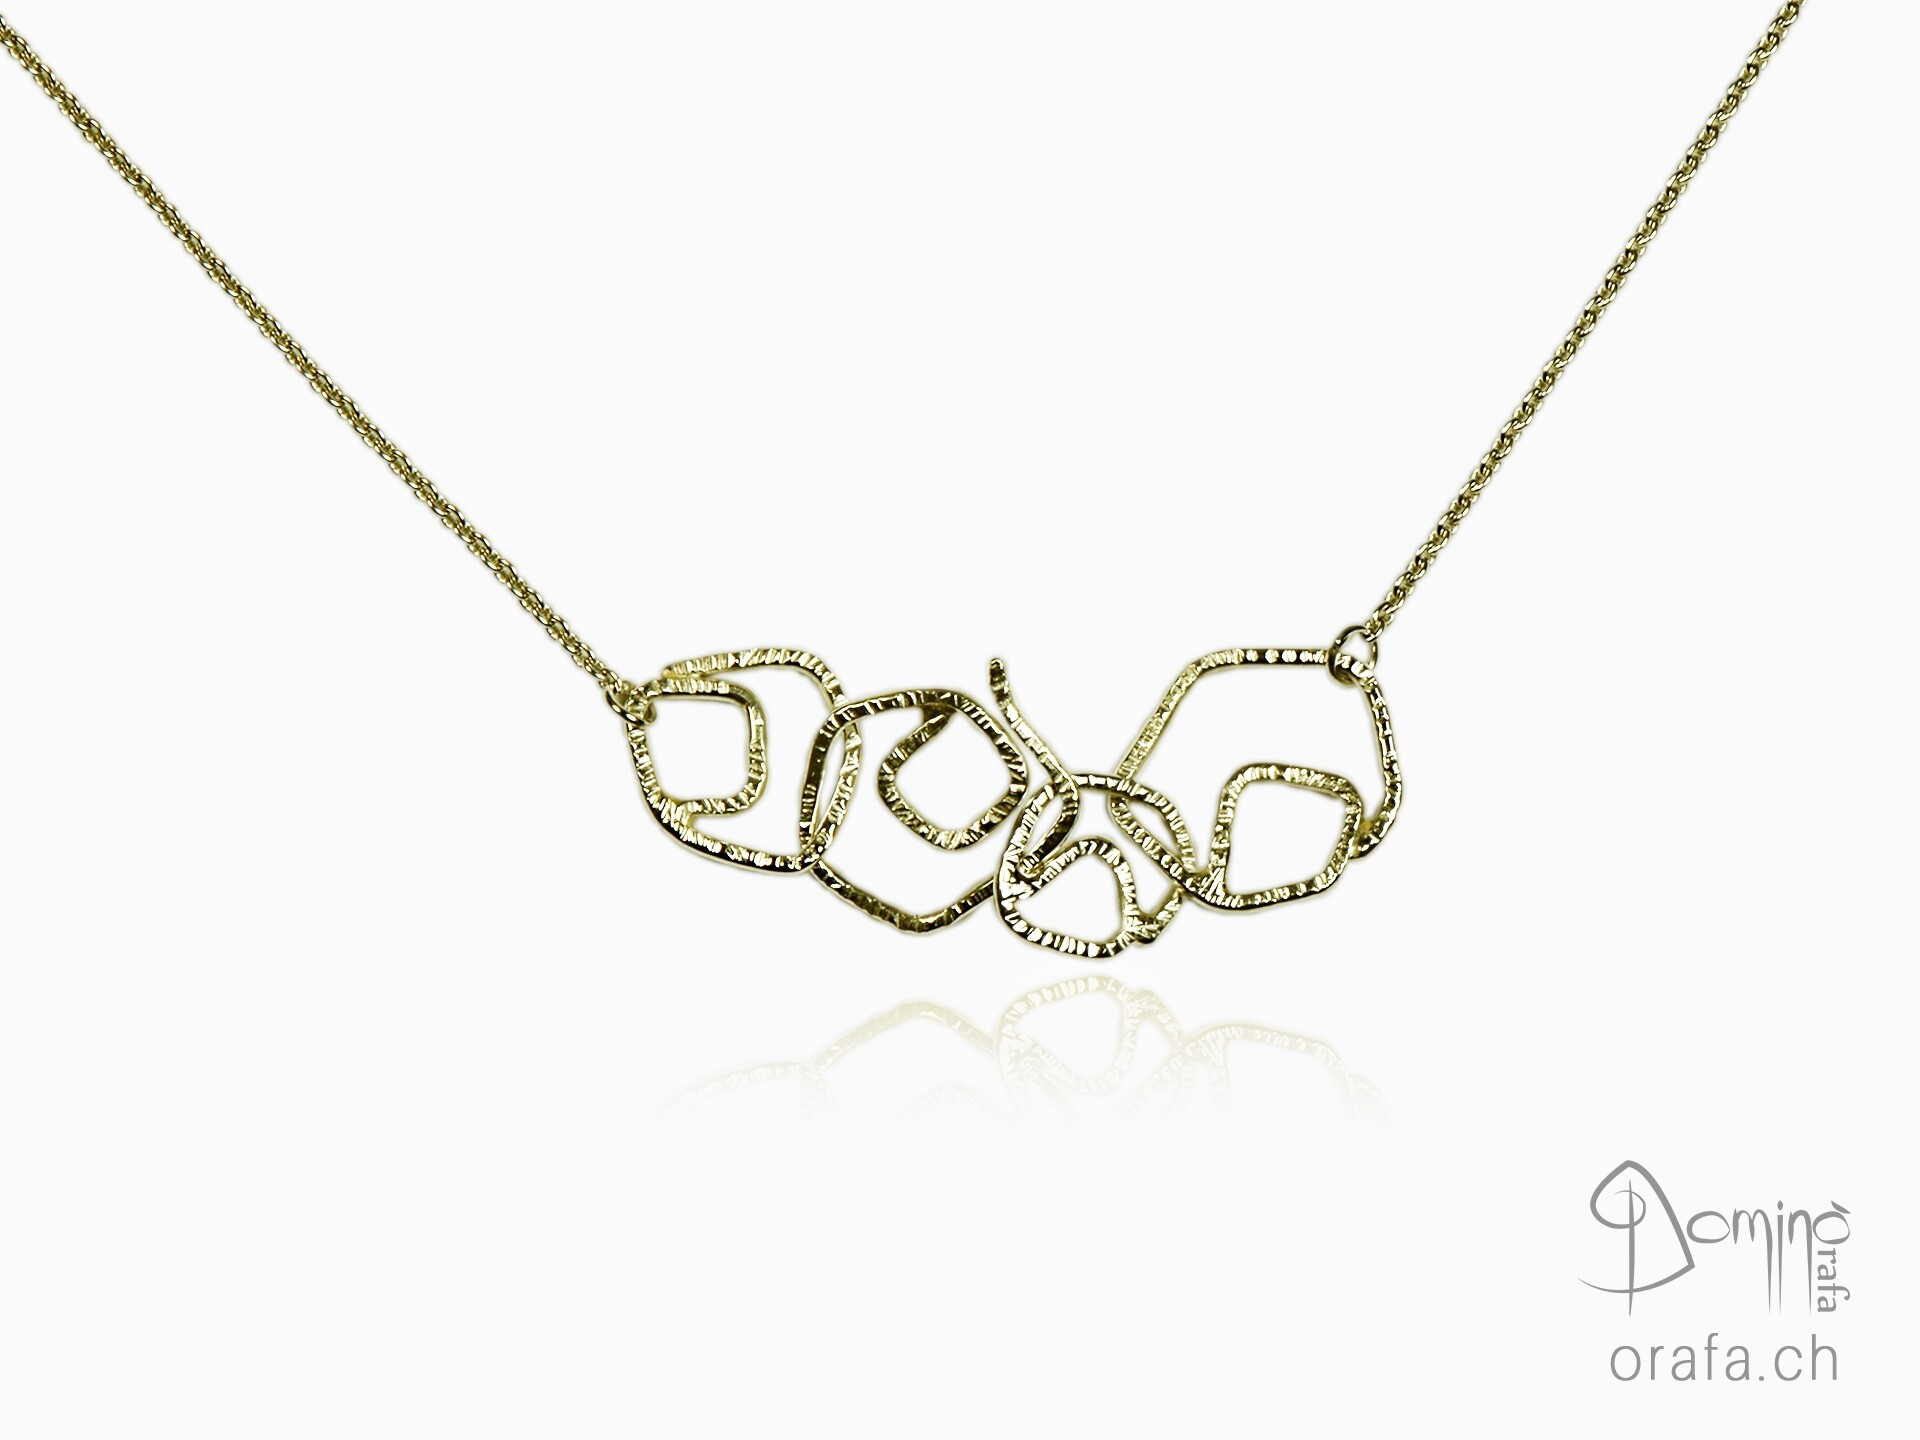 collana-4-elementi-fantasia-oro-giallo